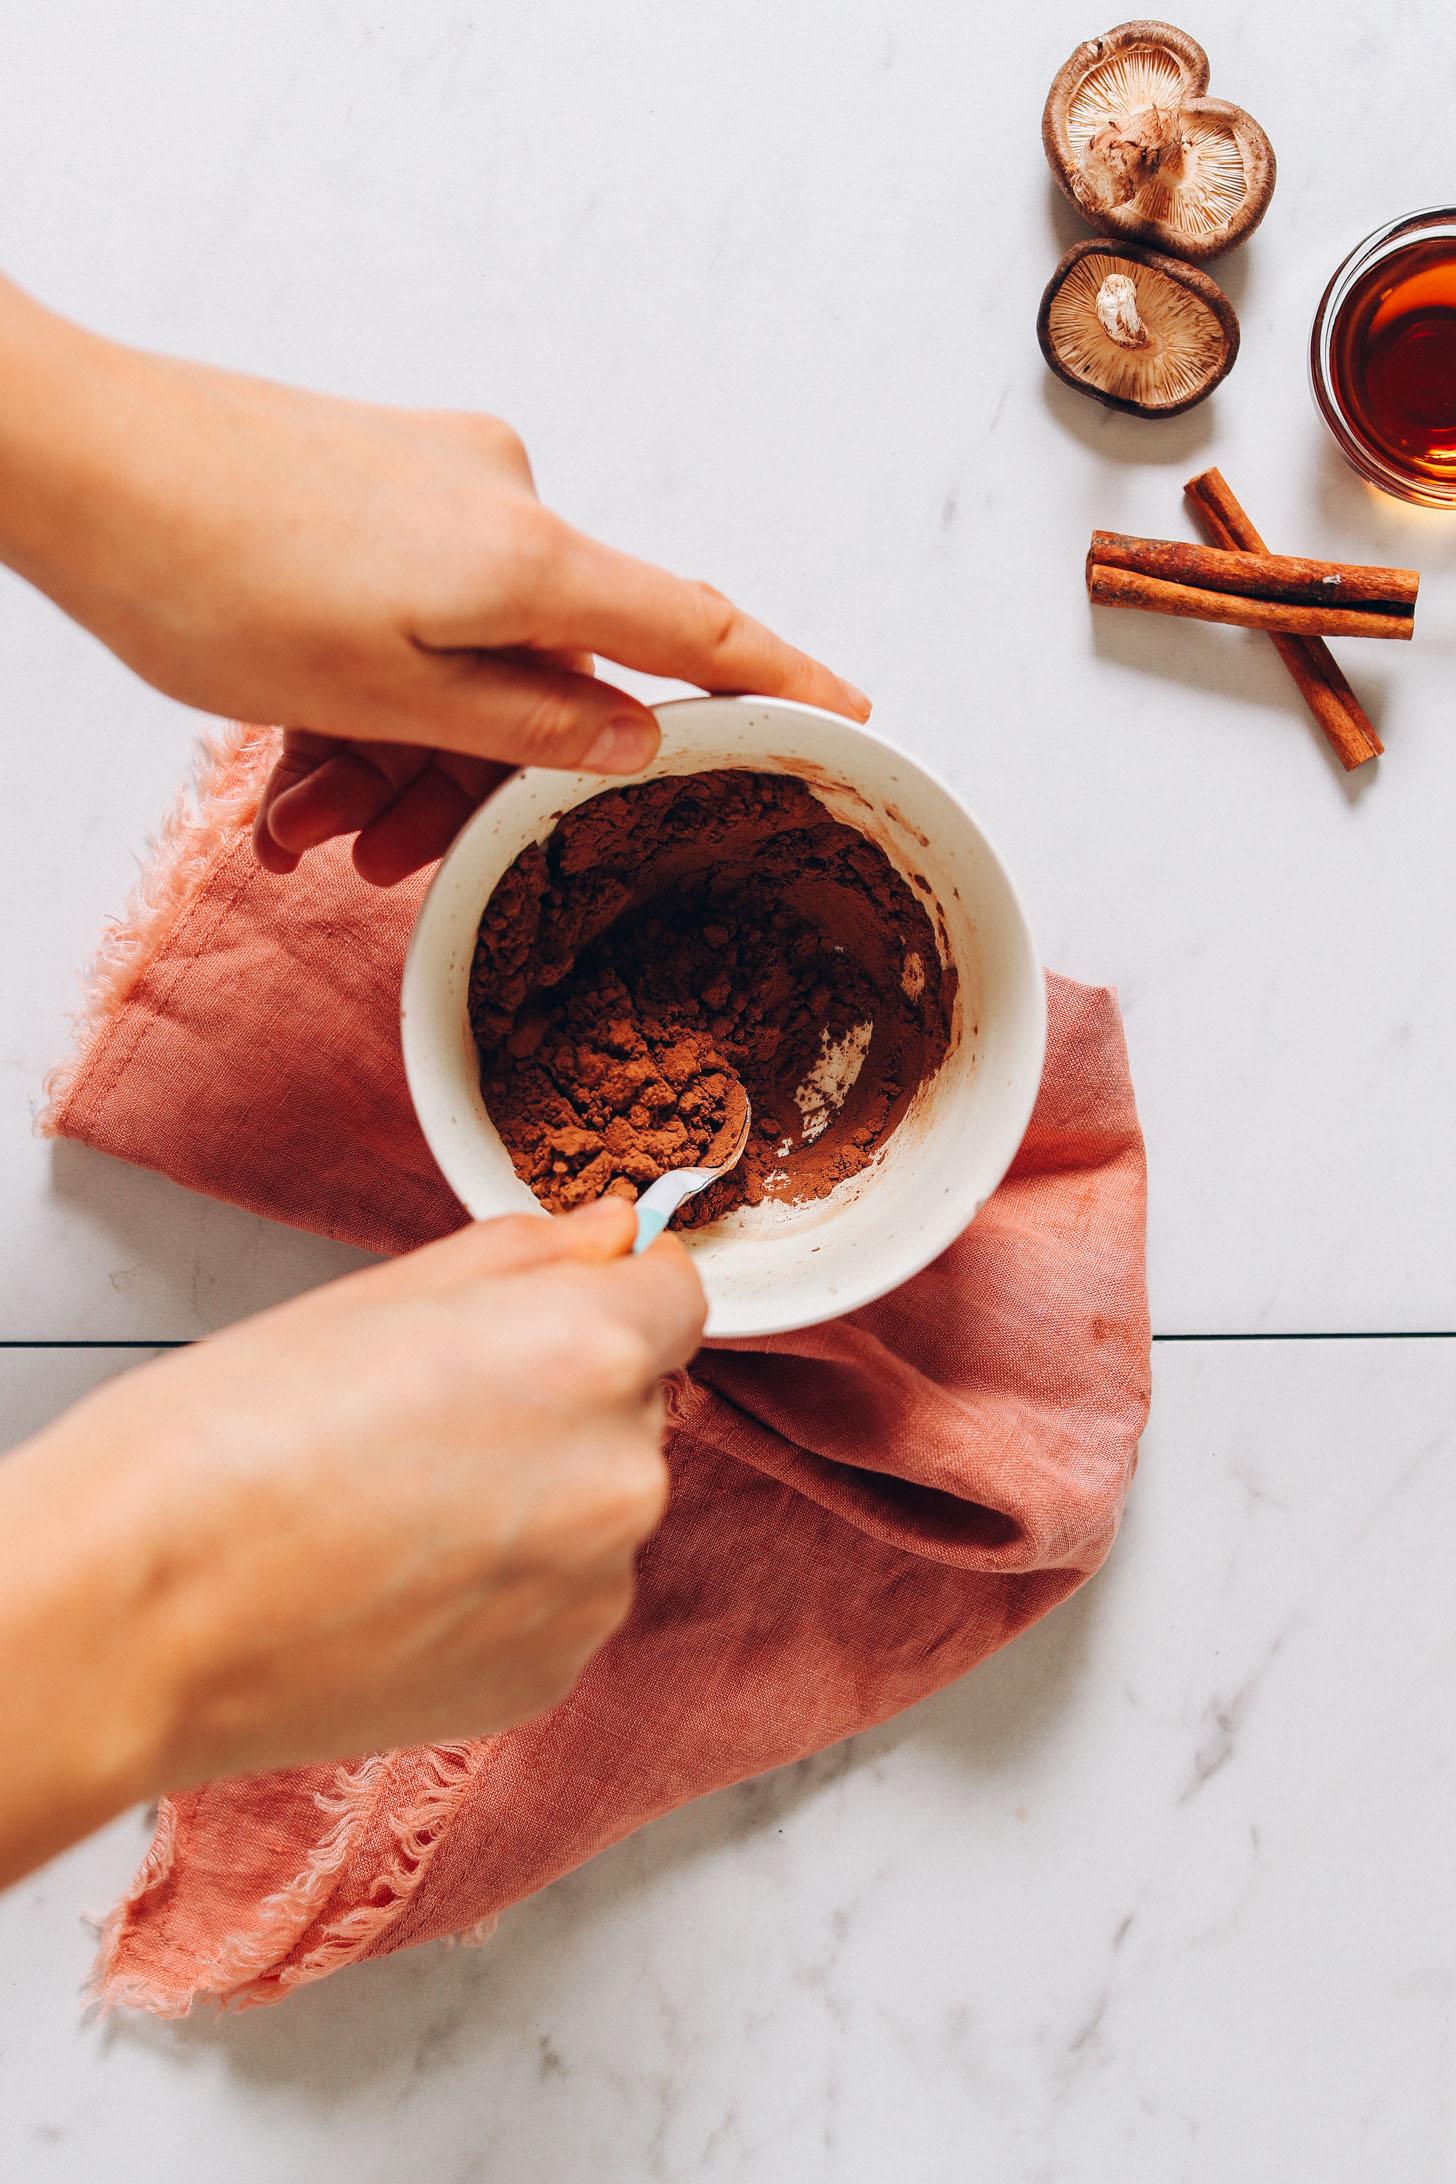 5-Minute Vegan Mushroom Latte | Minimalist Baker Recipes